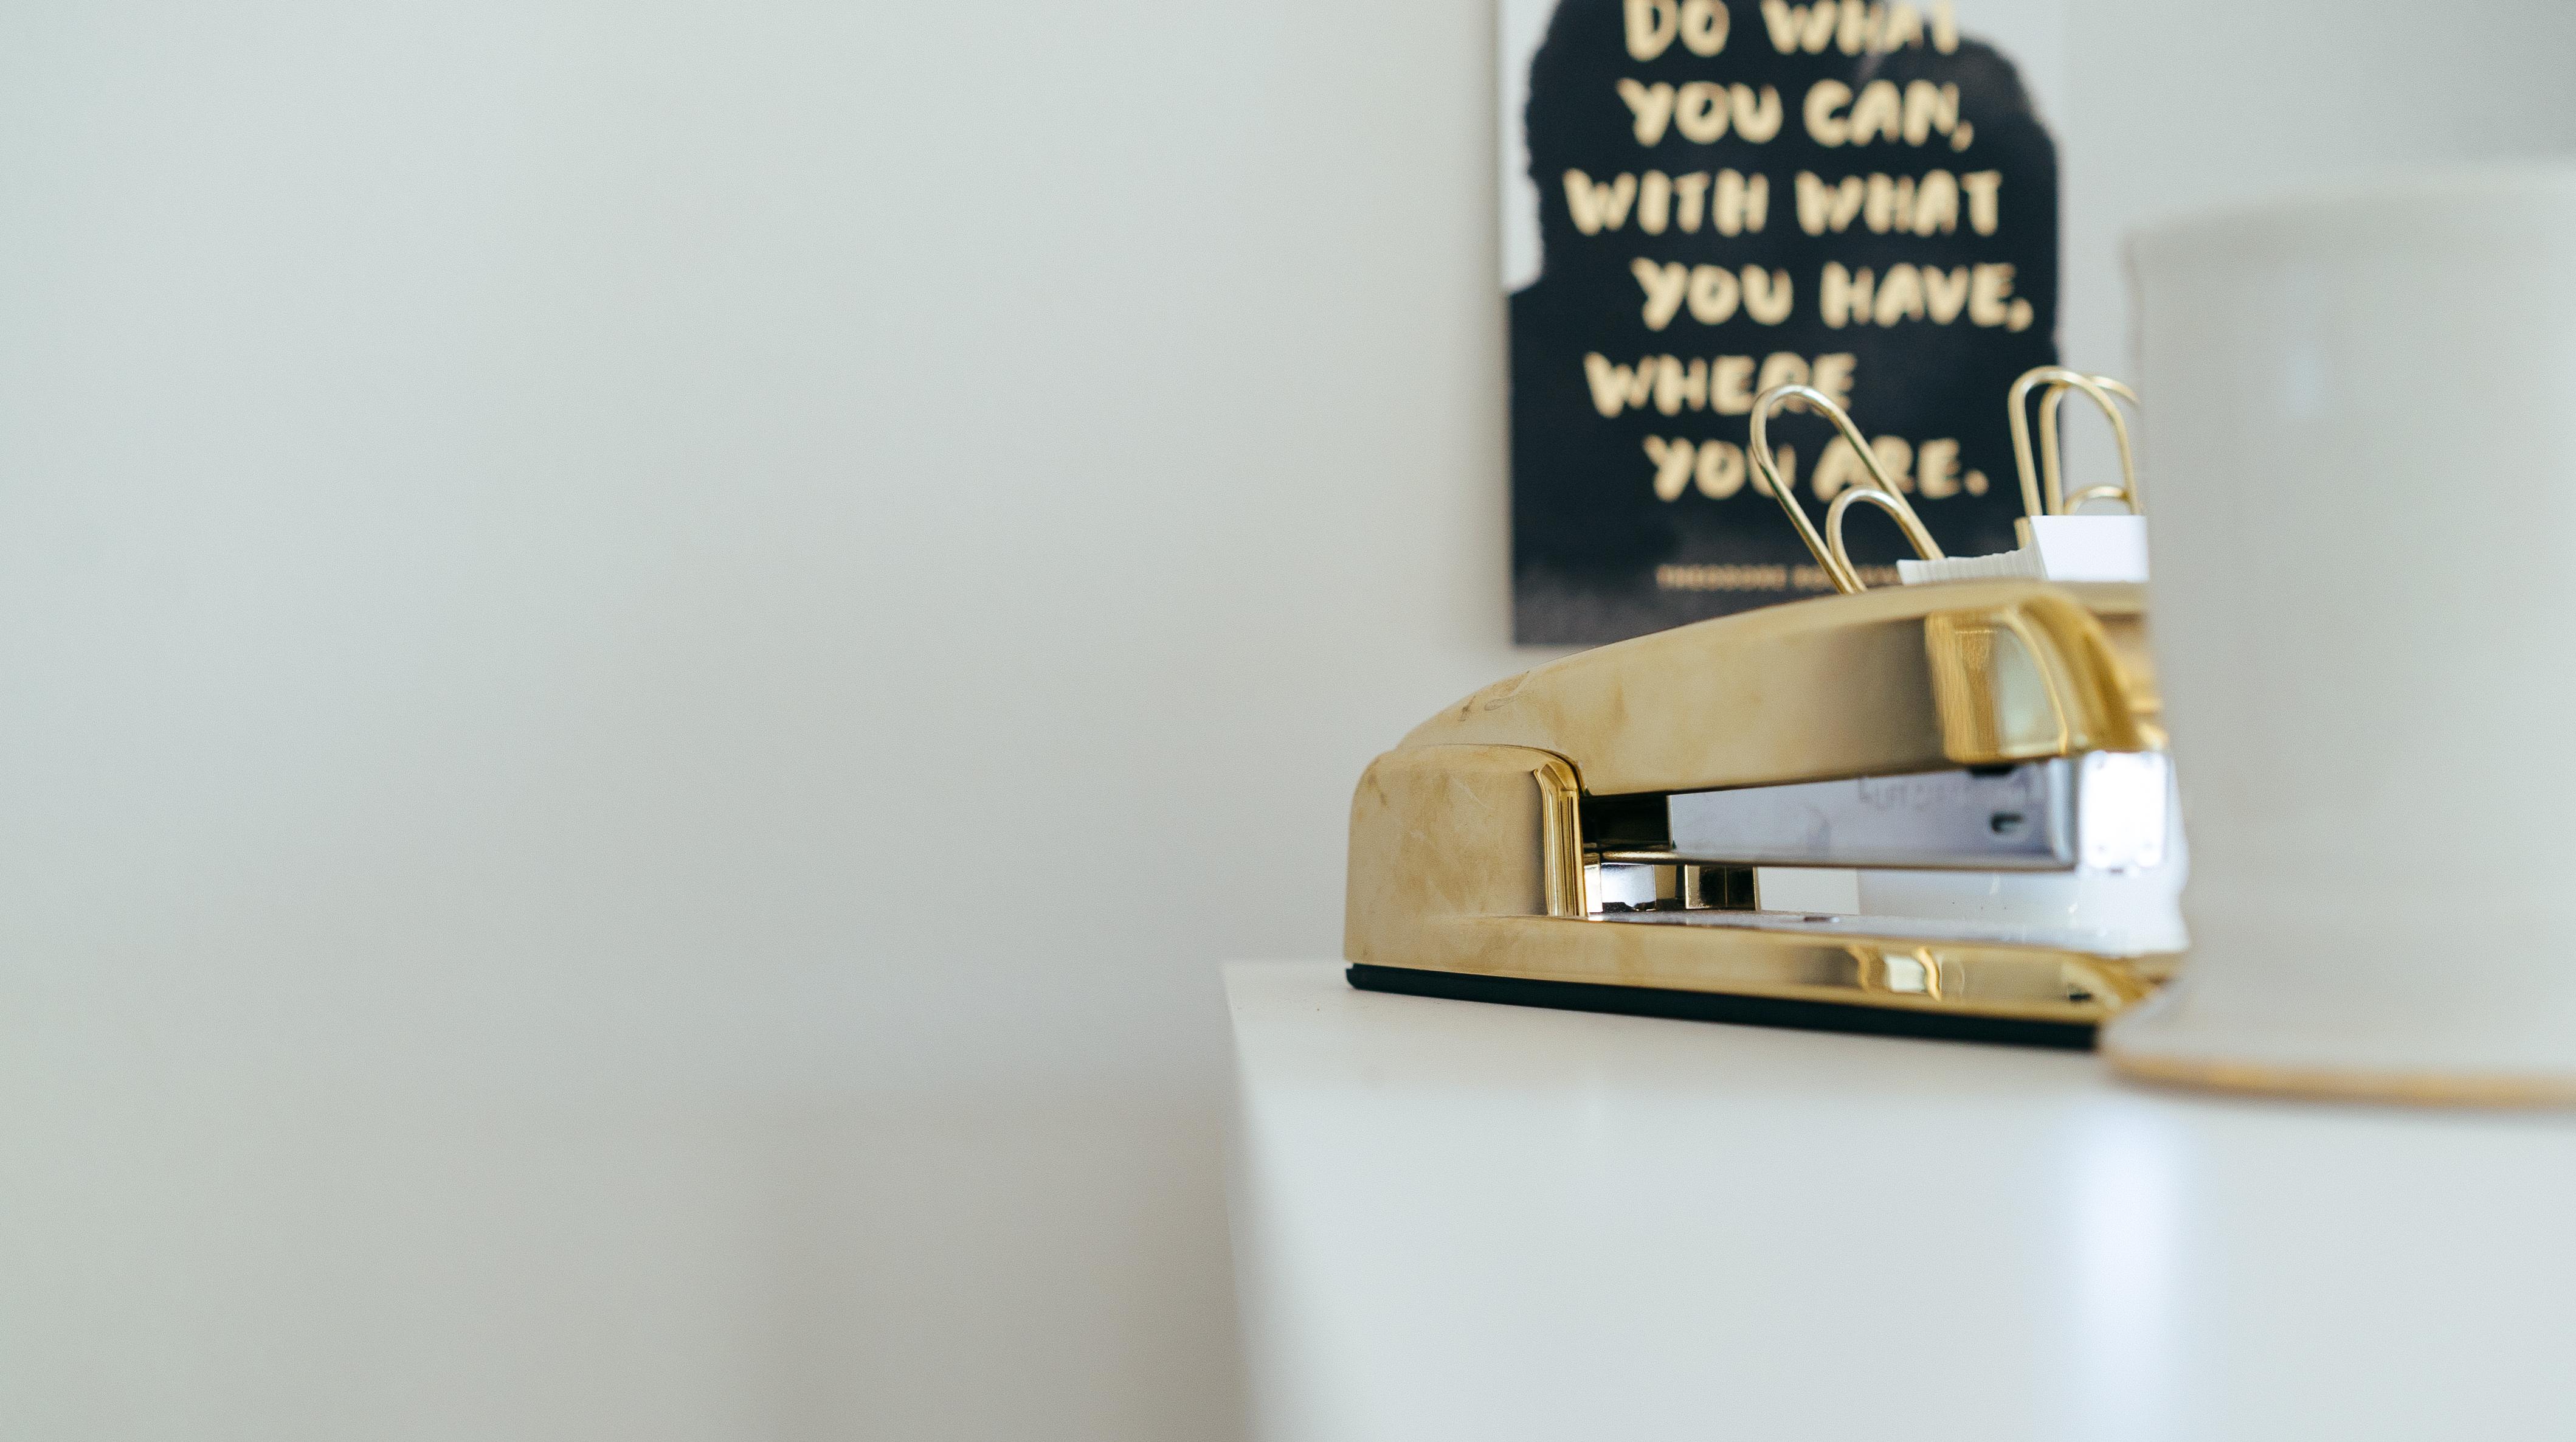 close-up-desk-stapler-and-motiv-sign